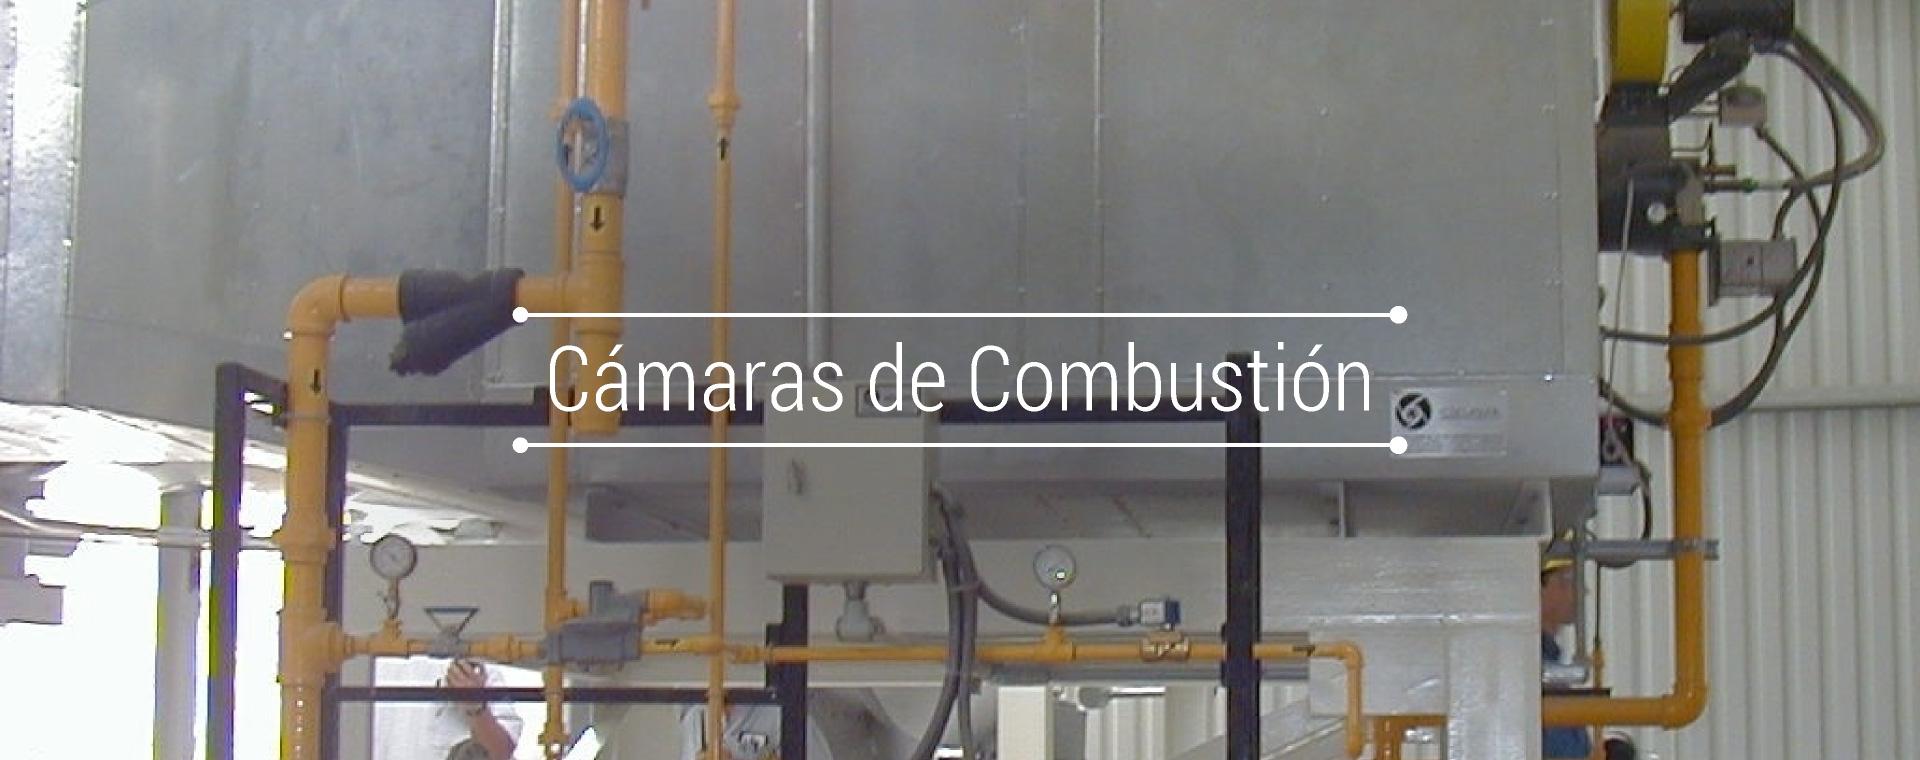 Camaras de Combustion